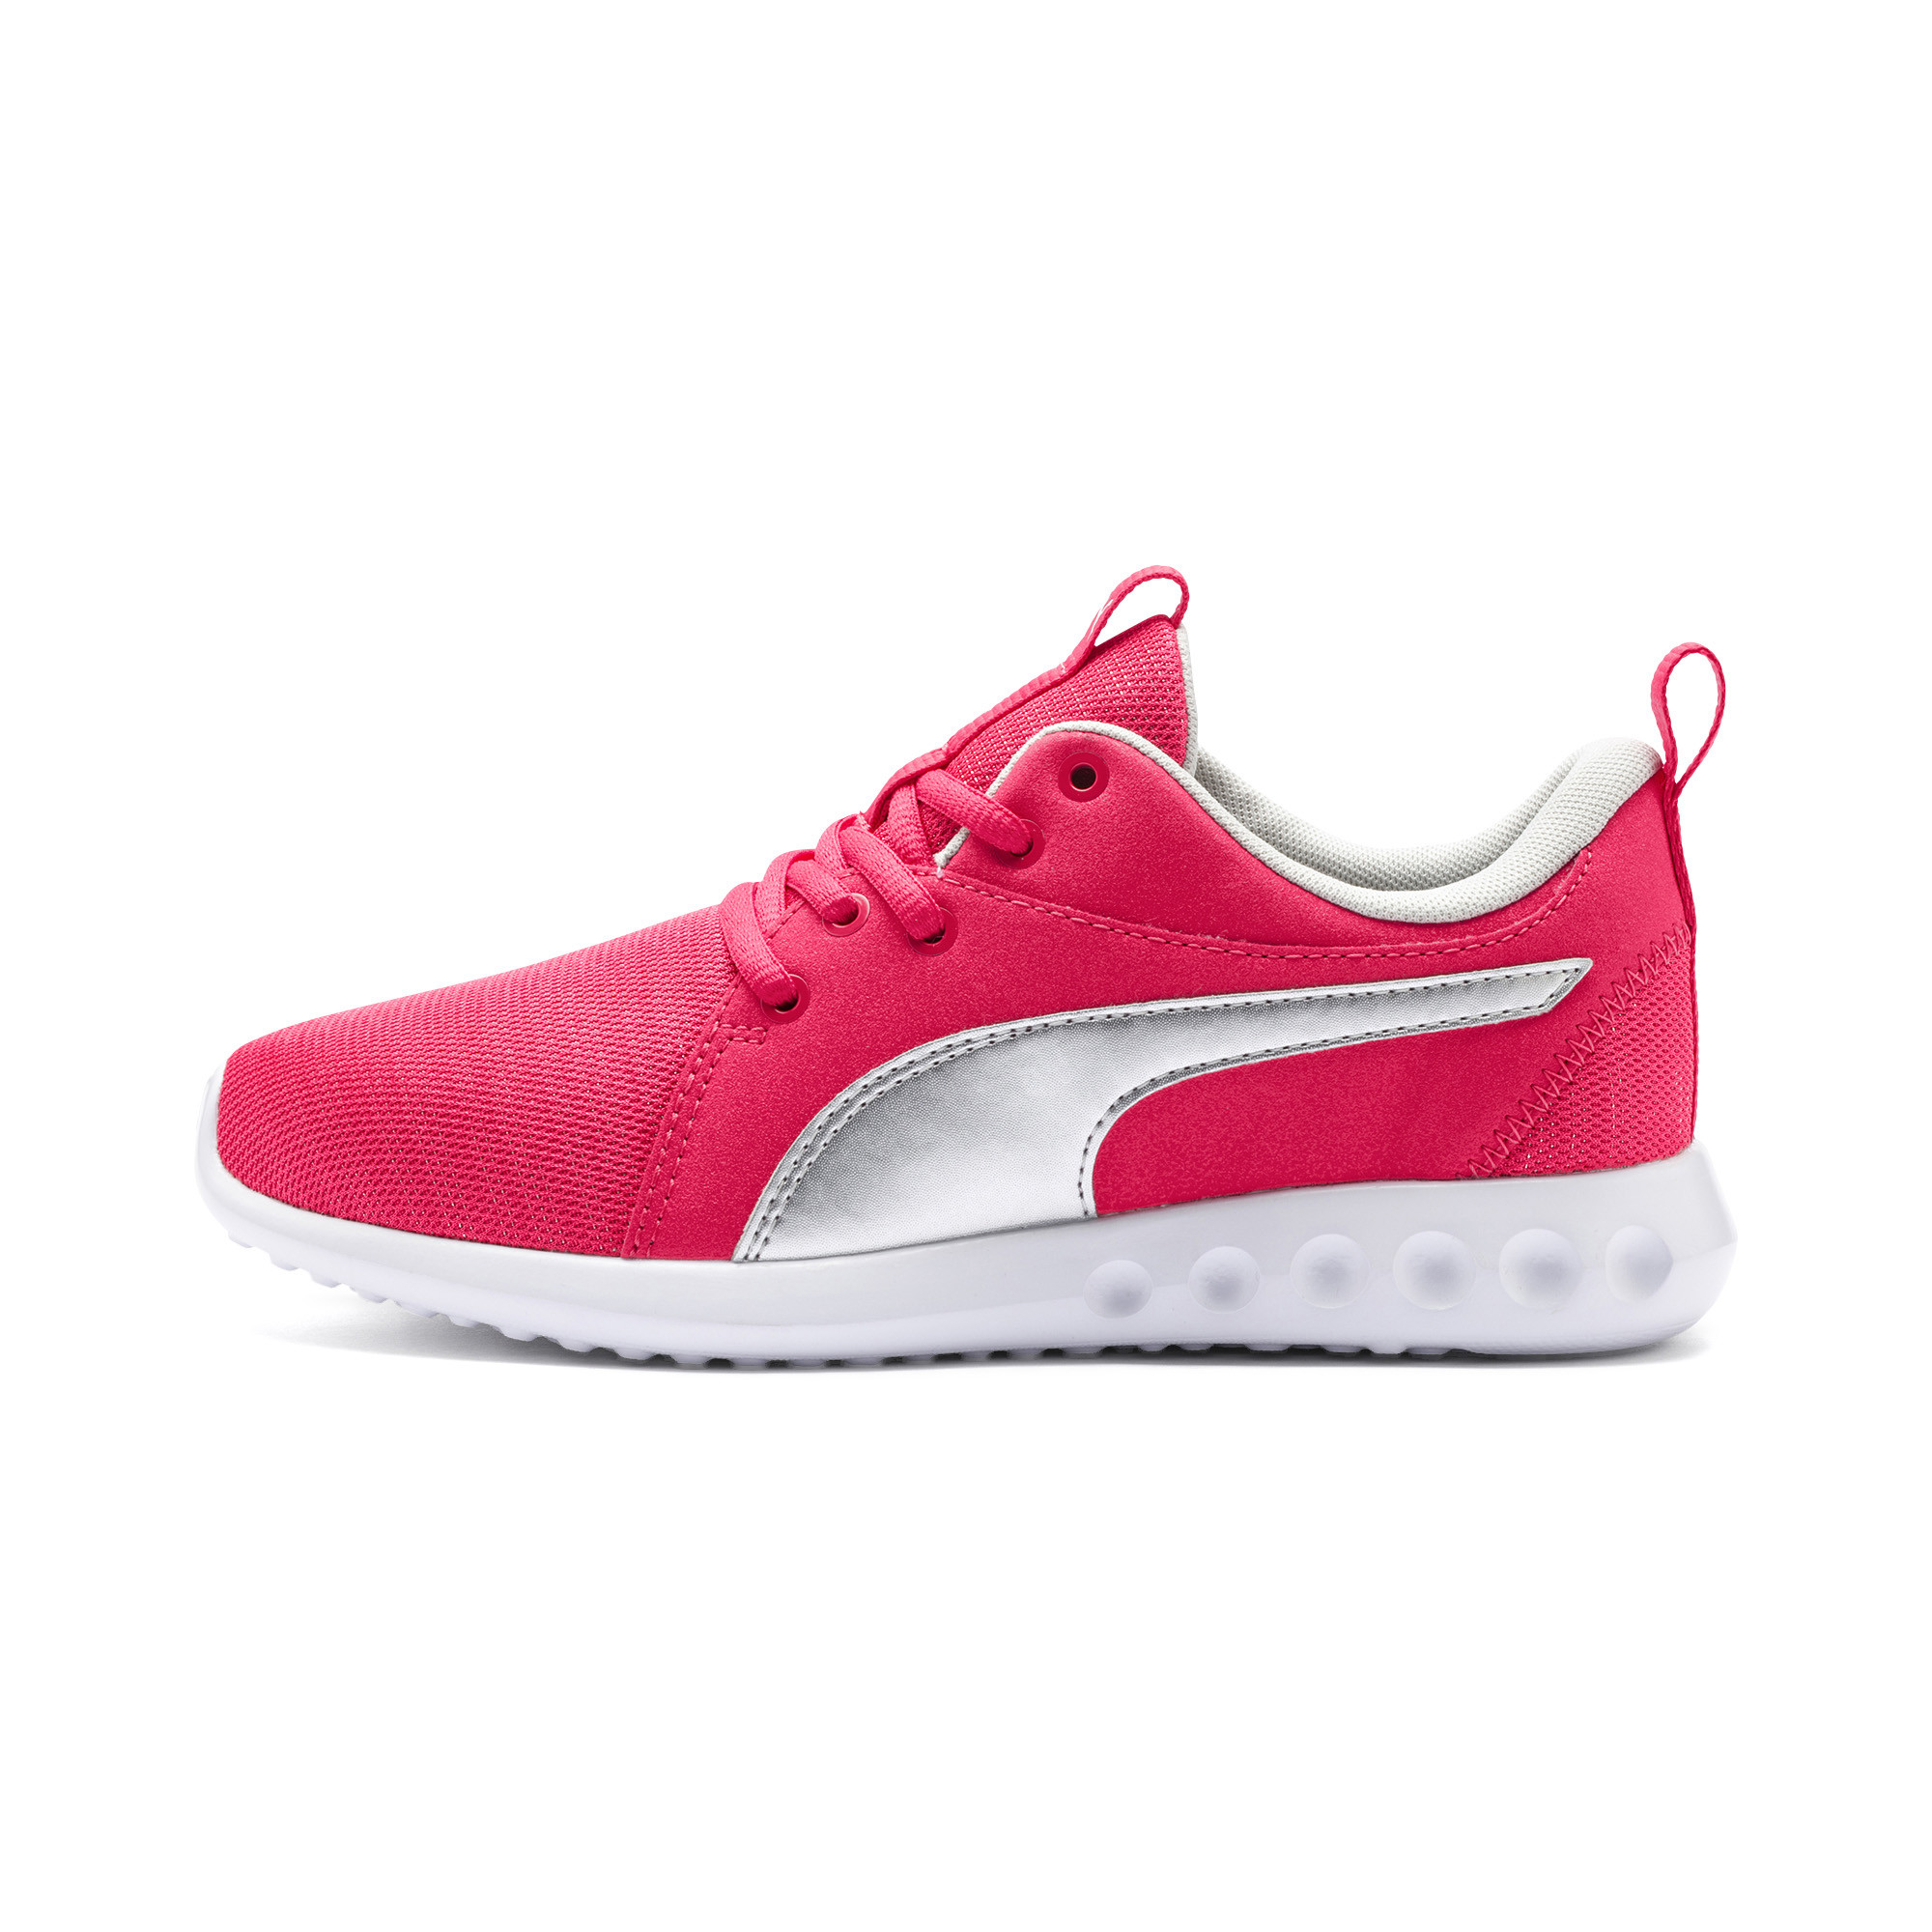 PUMA-Carson-2-Glitz-Shoes-JR-Girls-Shoe-Kids thumbnail 4